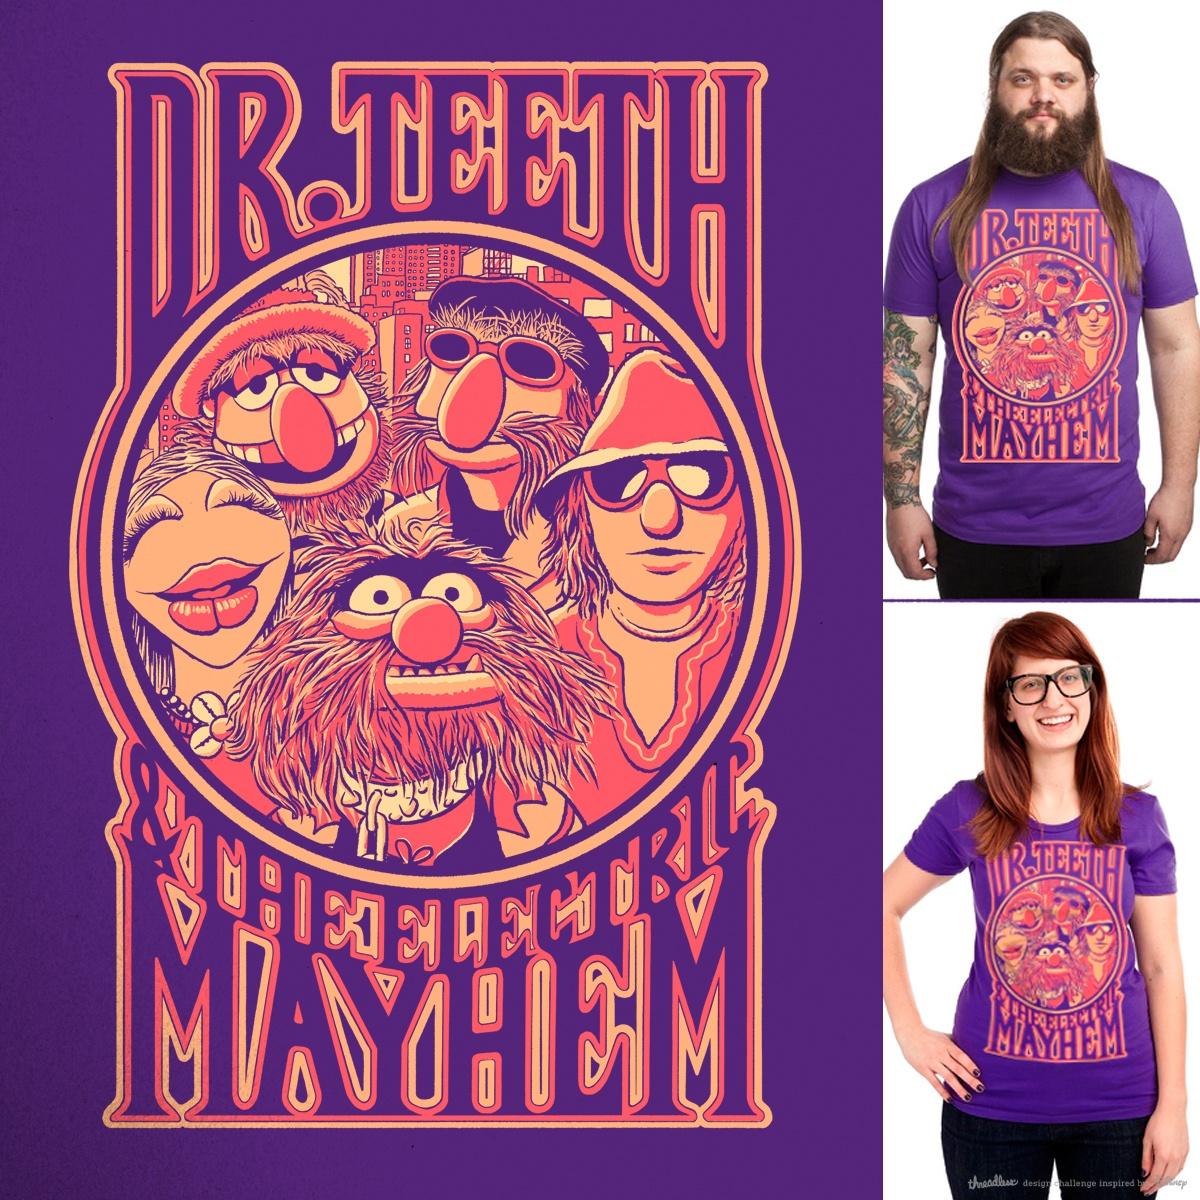 Electric Mayhem by v_calahan on Threadless